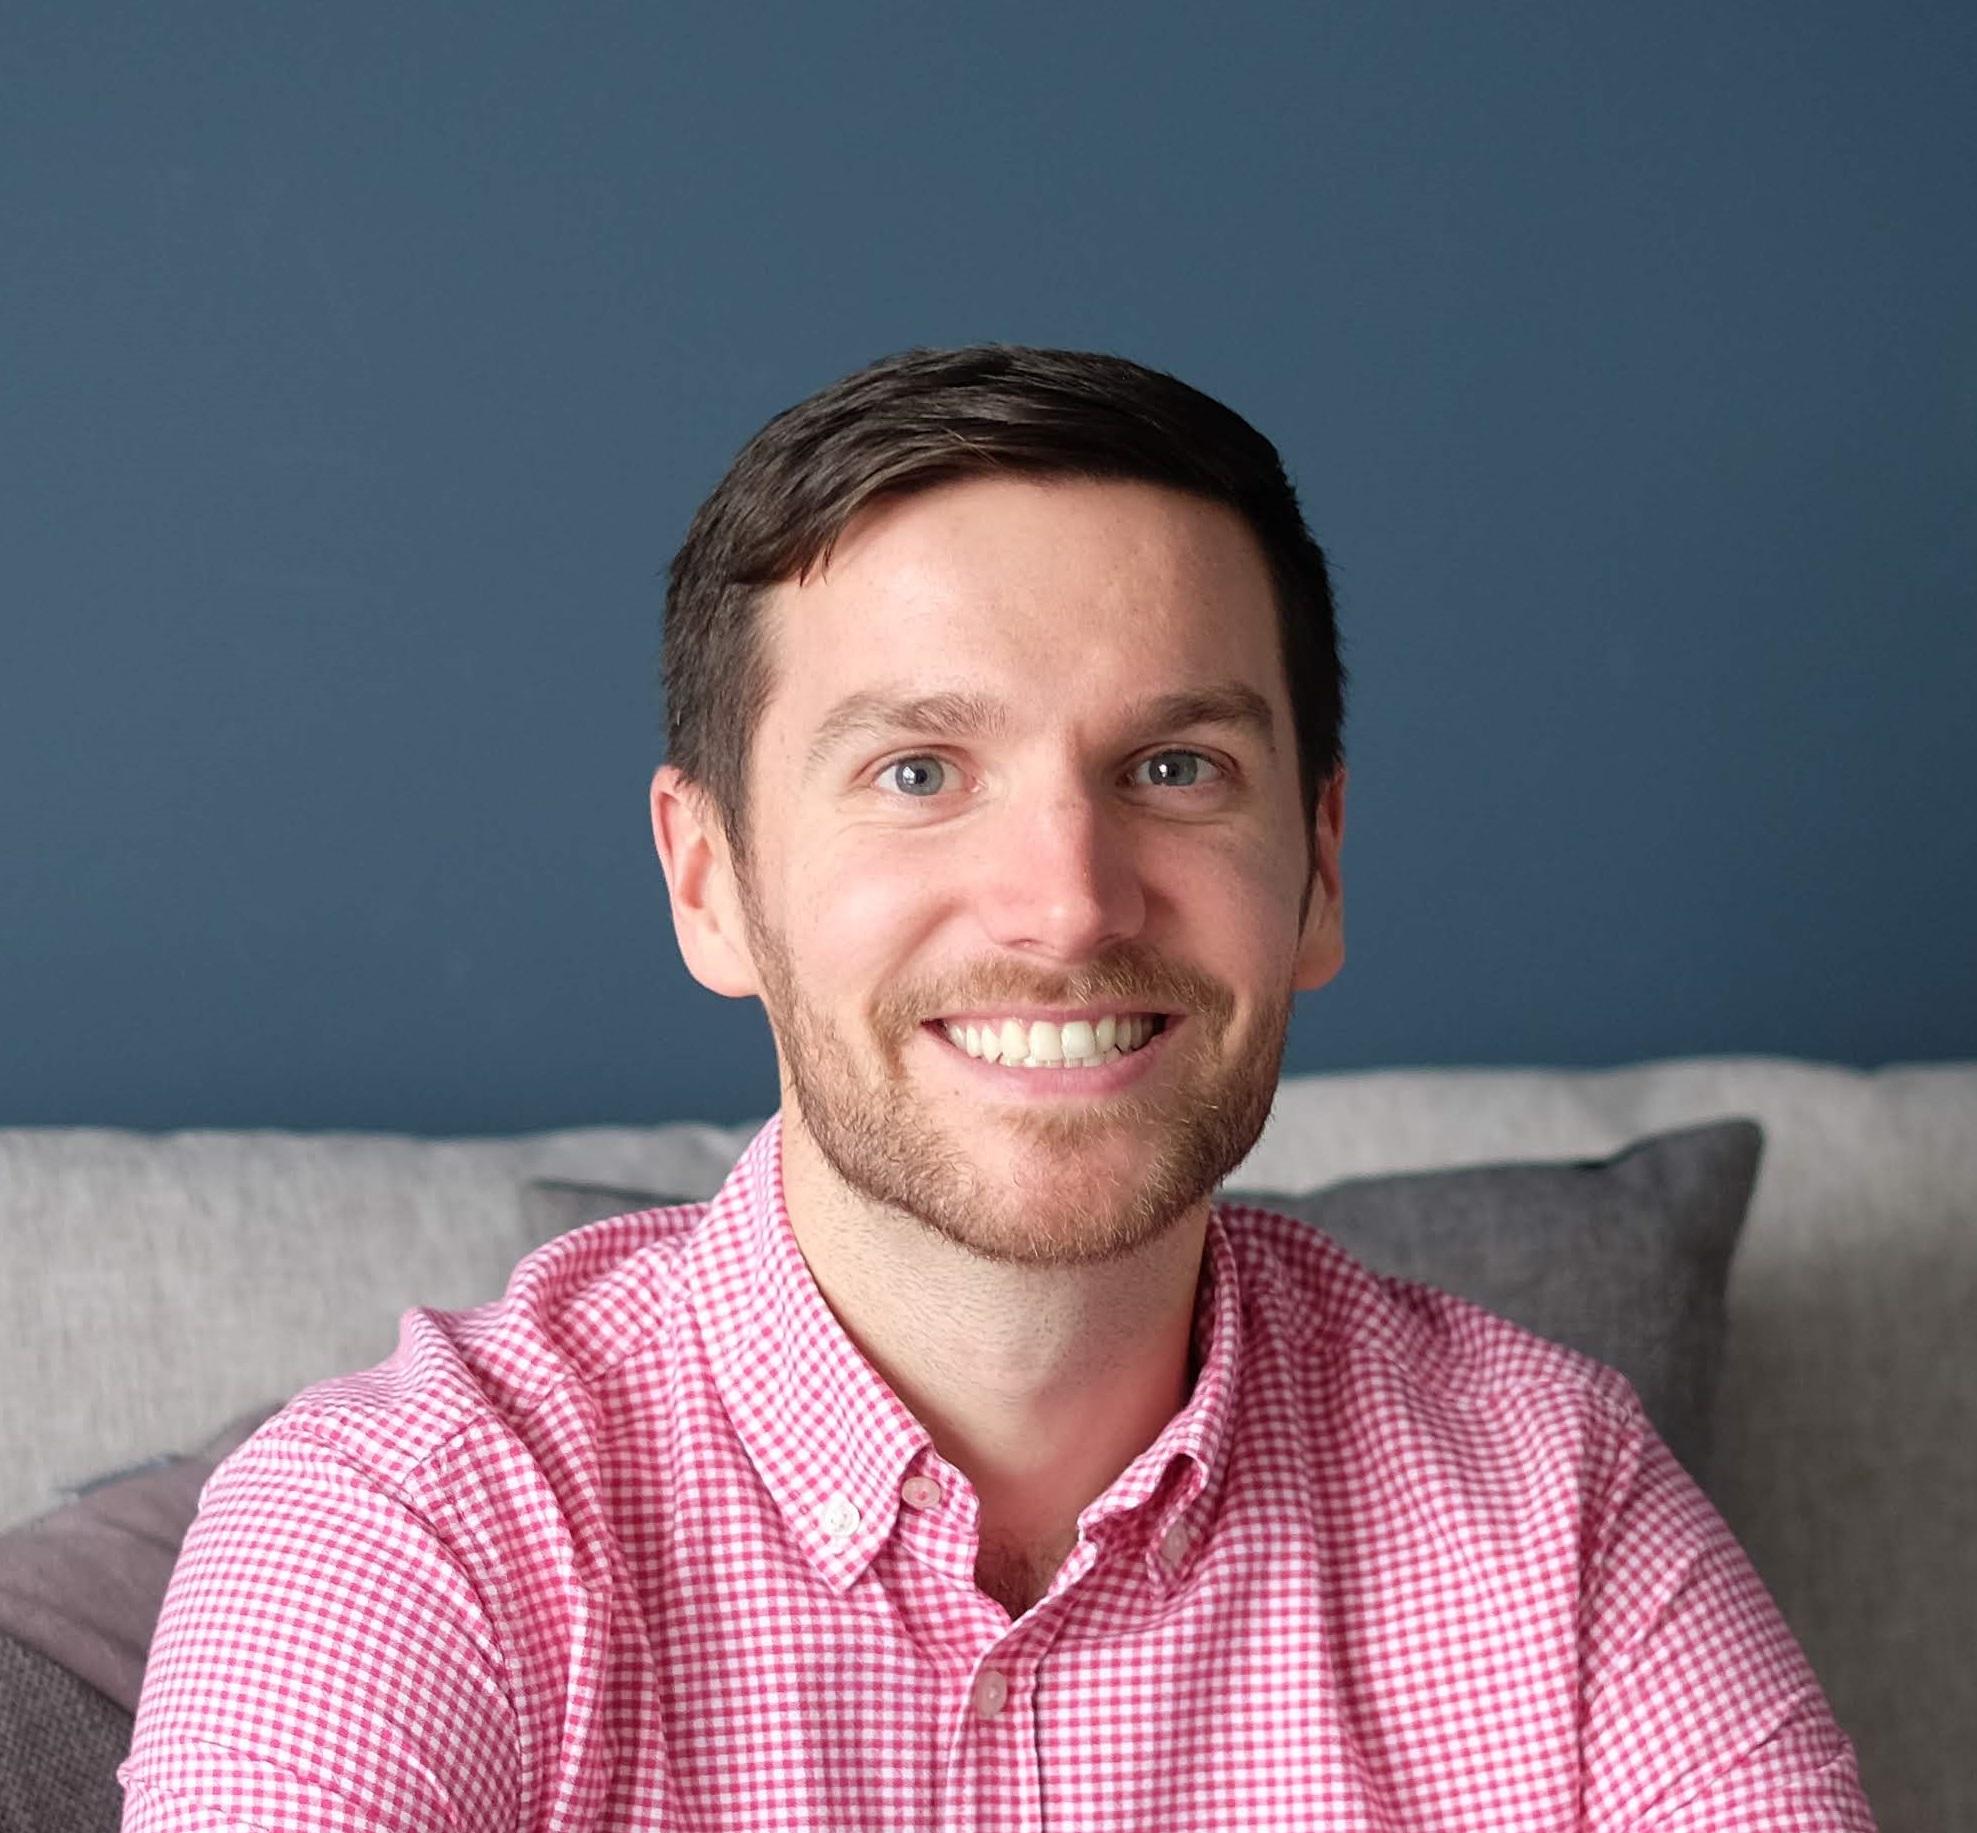 Evan Hallward | Founder of Aboard